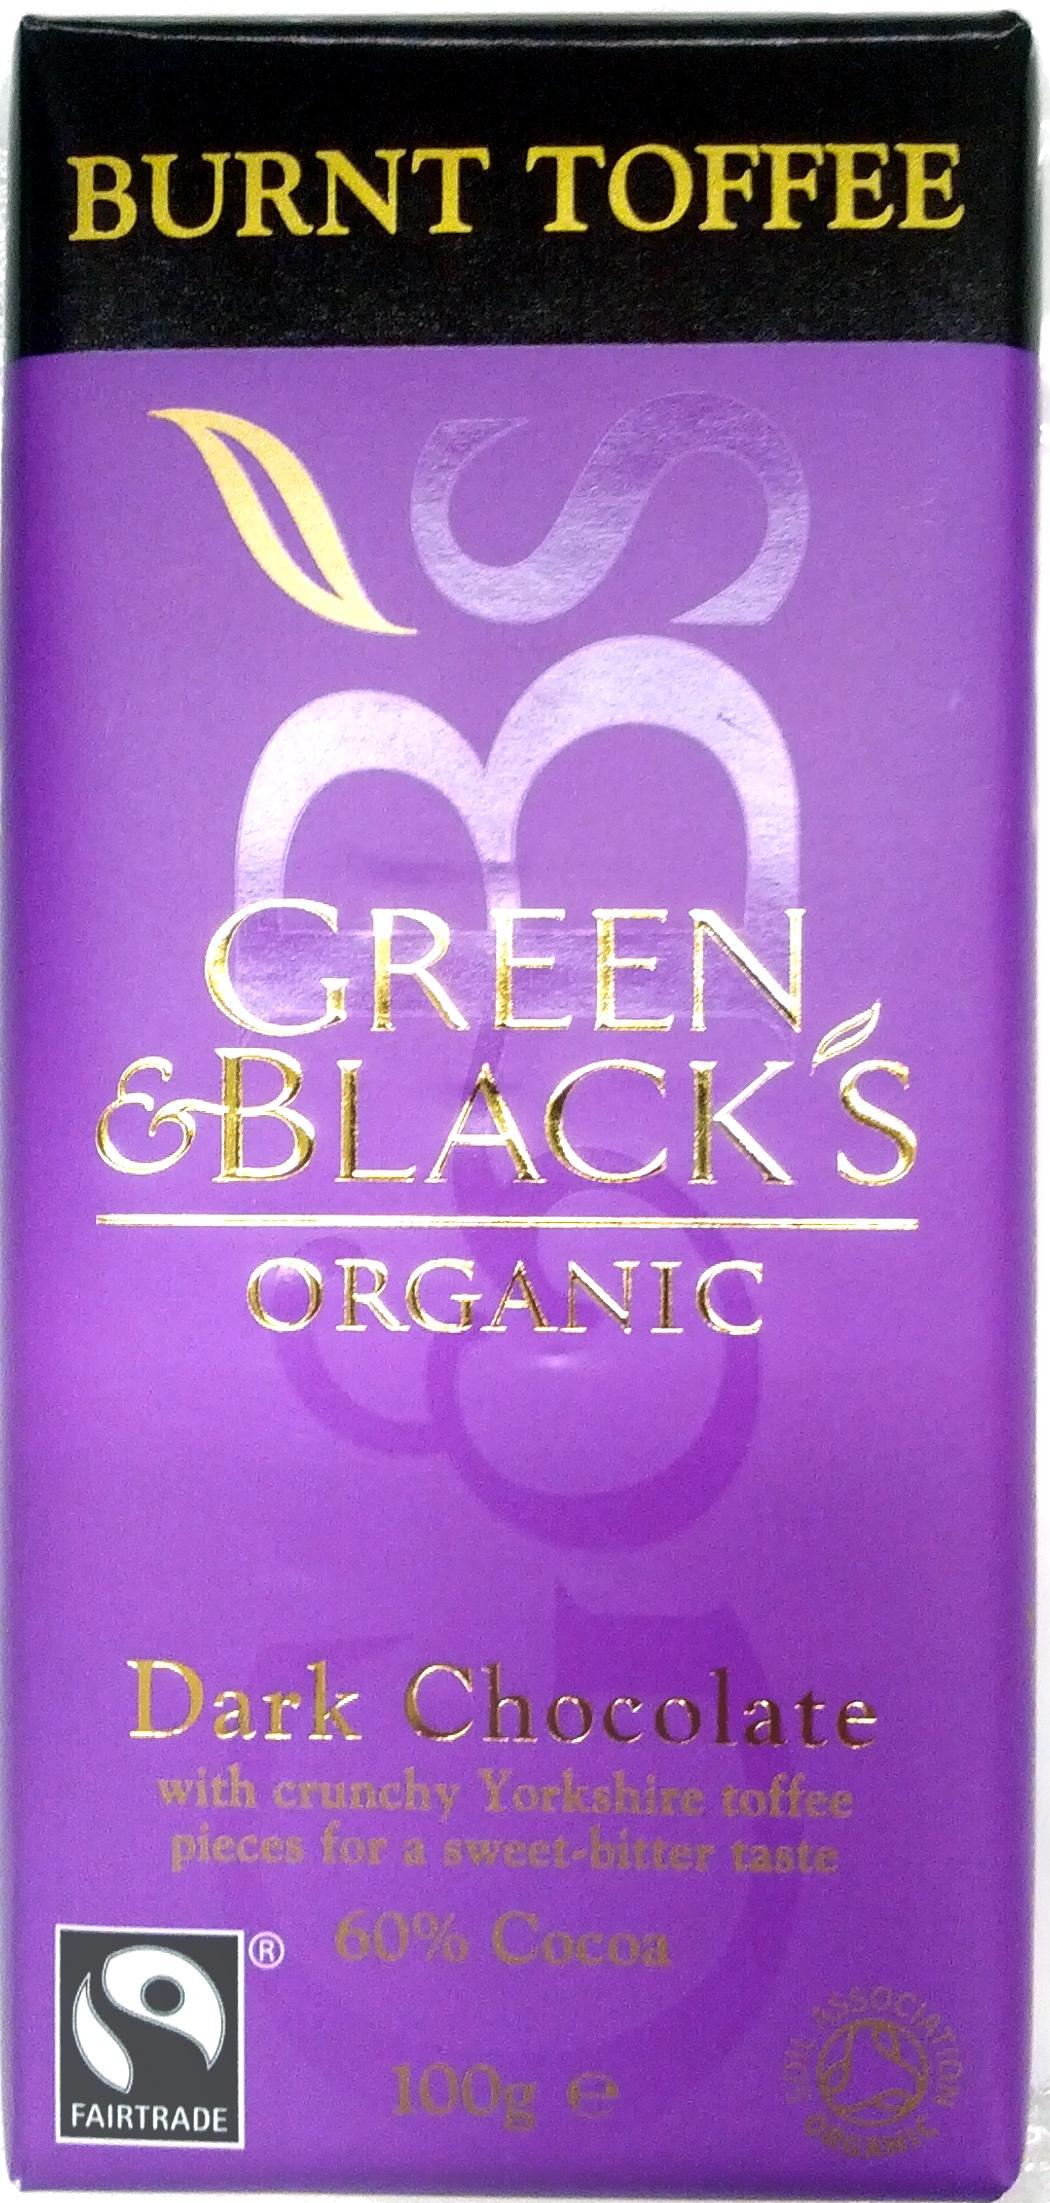 Green & black's organic chocolate bar dark with toffee - Product - en